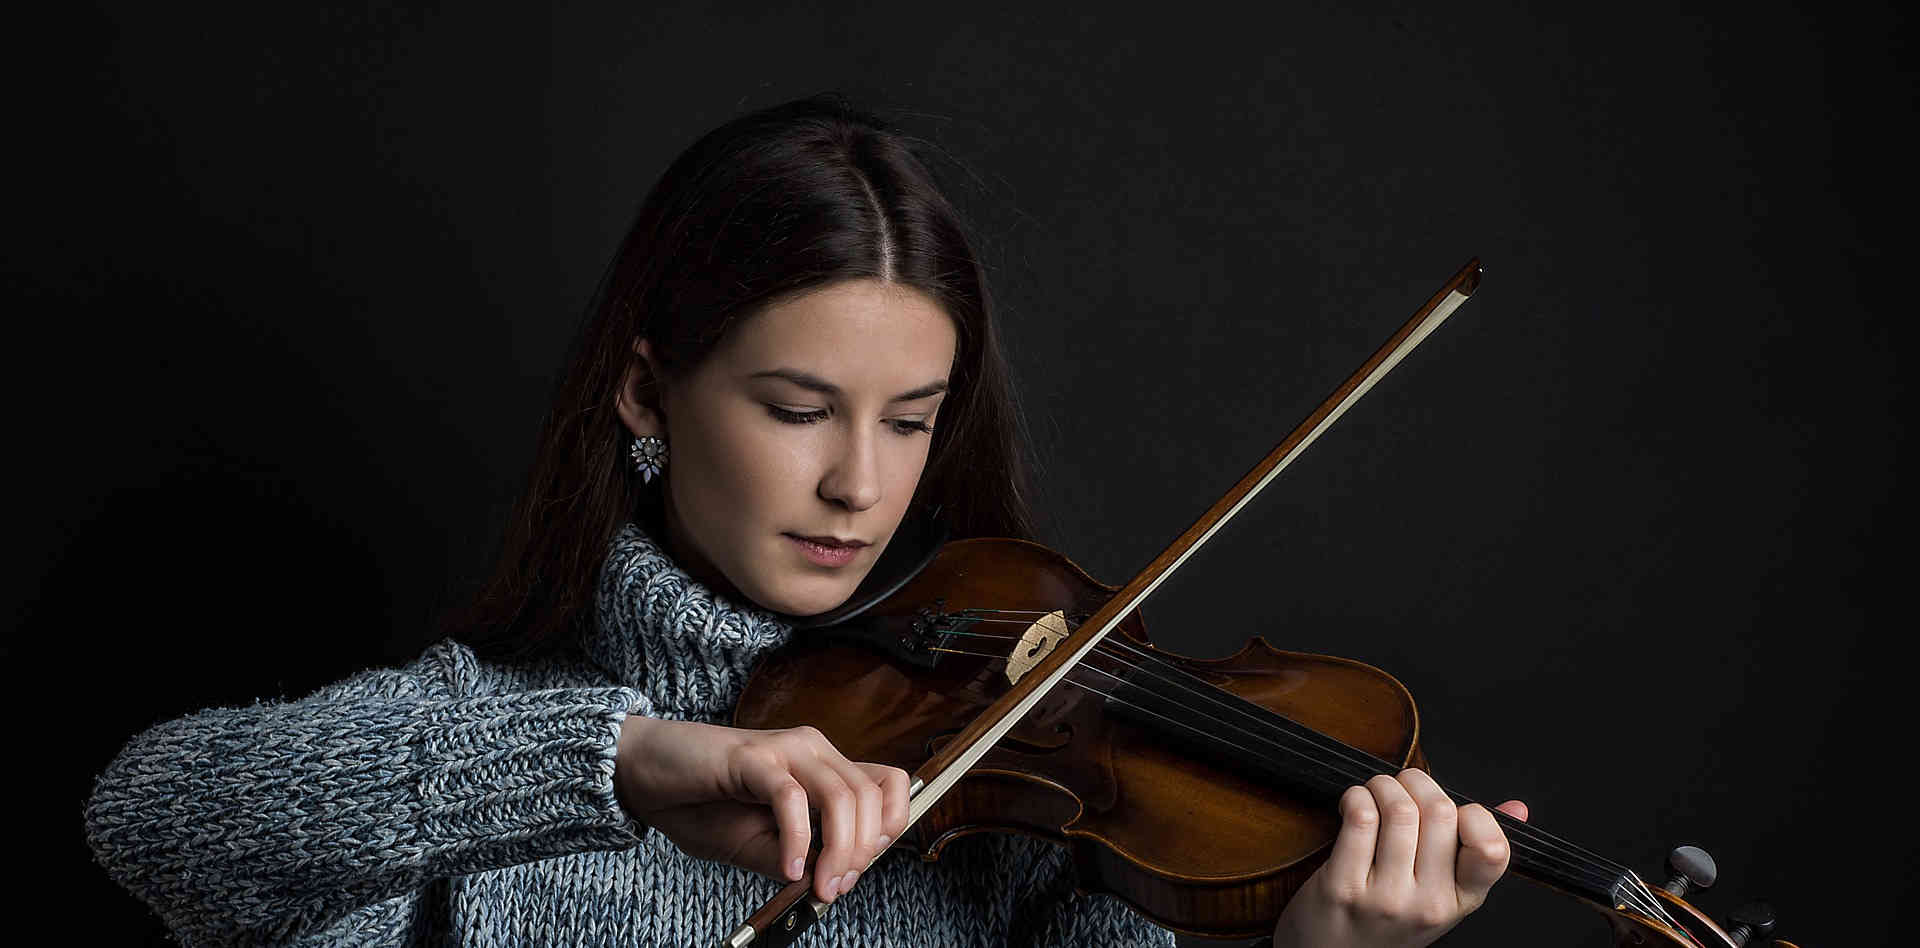 girl-3961381_1920 violinist (1).jpg